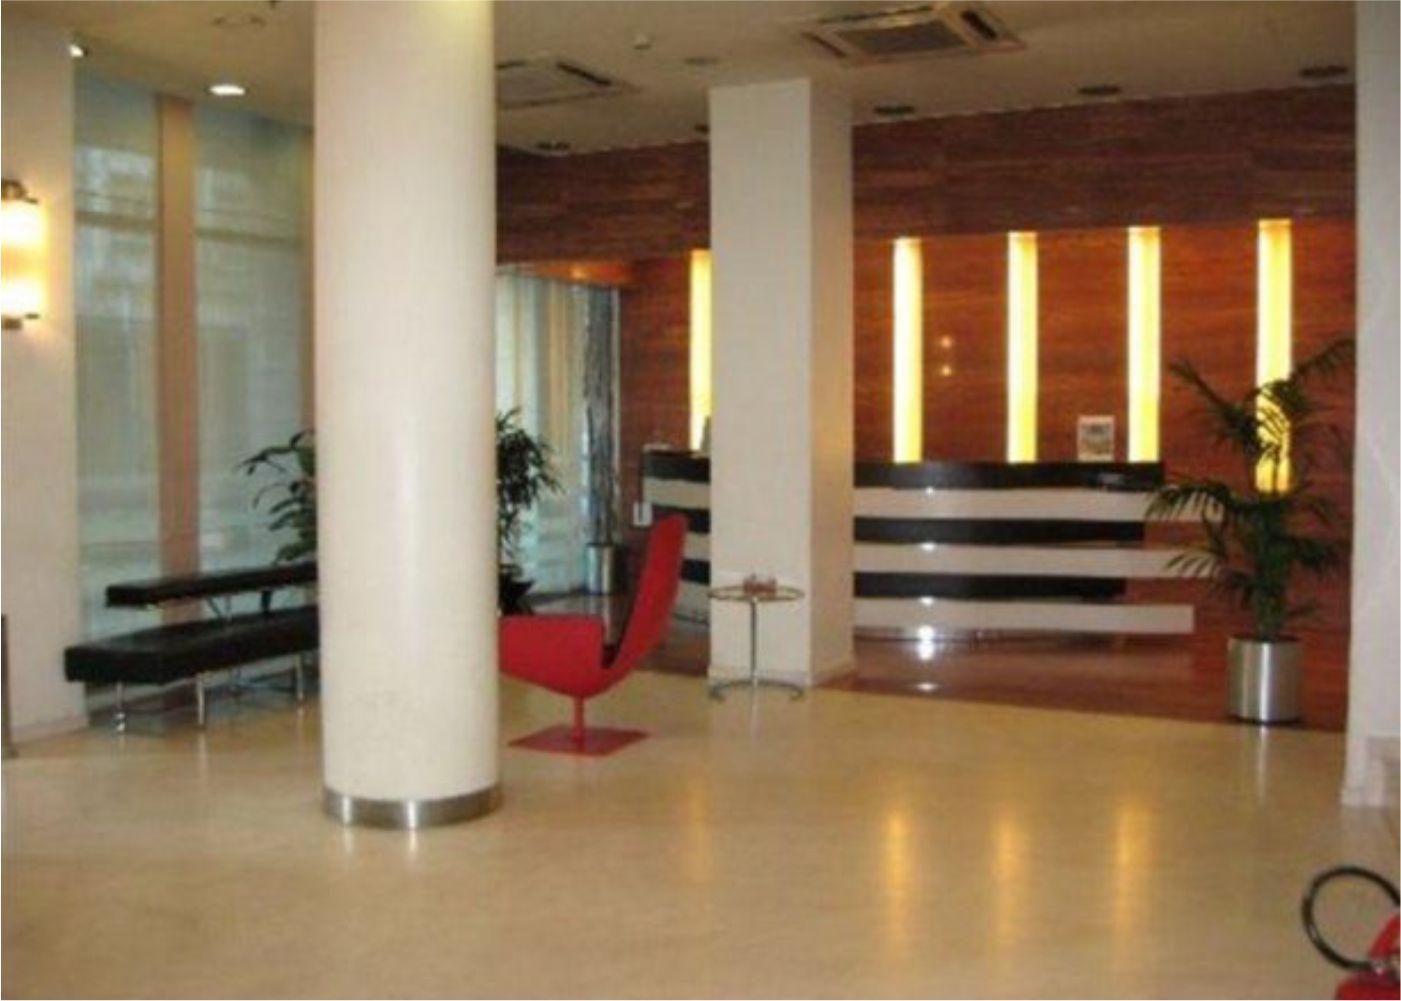 paraskevi-interior-kaningos-21-hotel-10